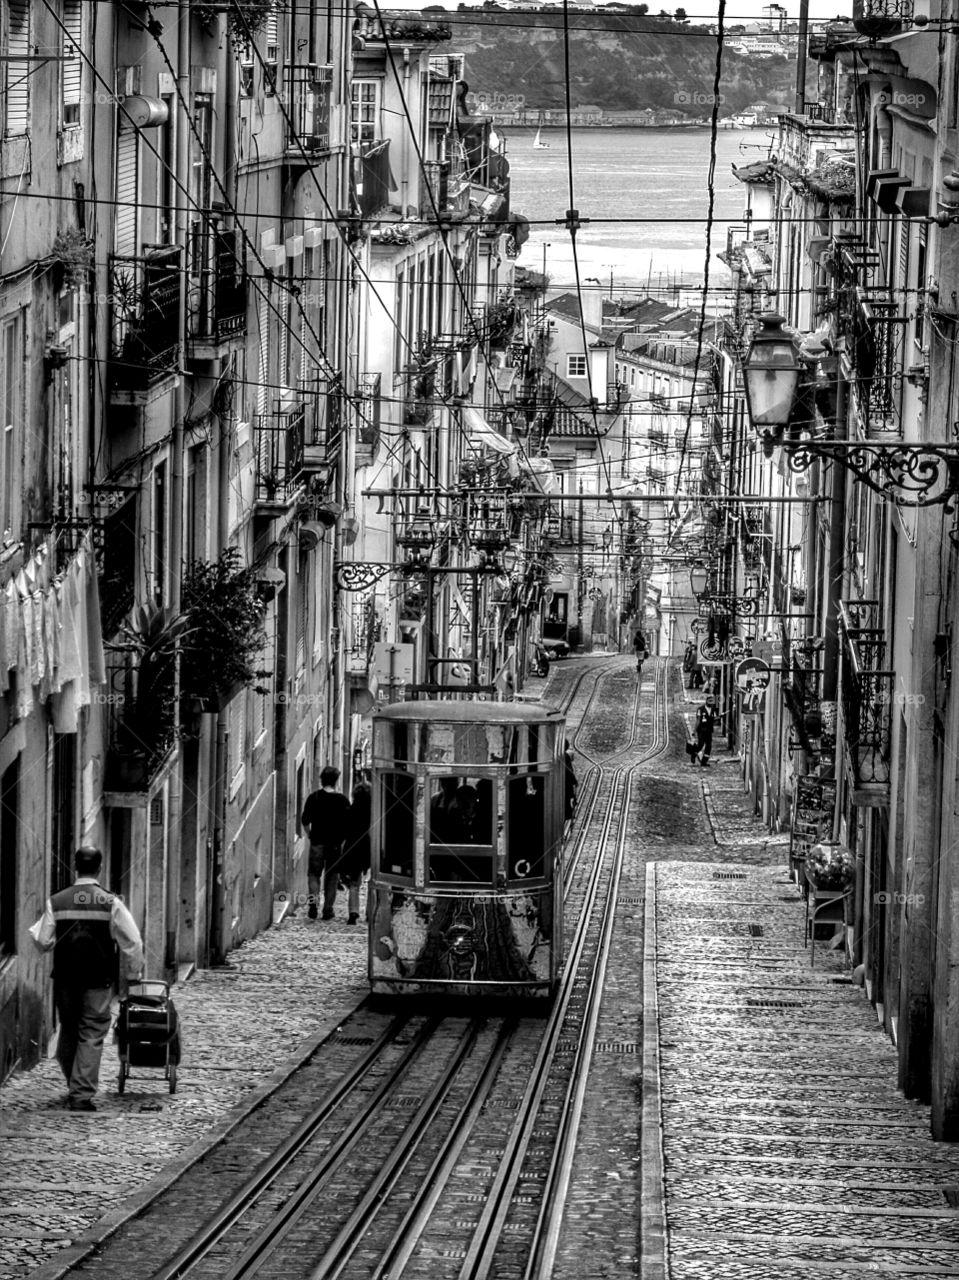 Bica funicular in black and white.